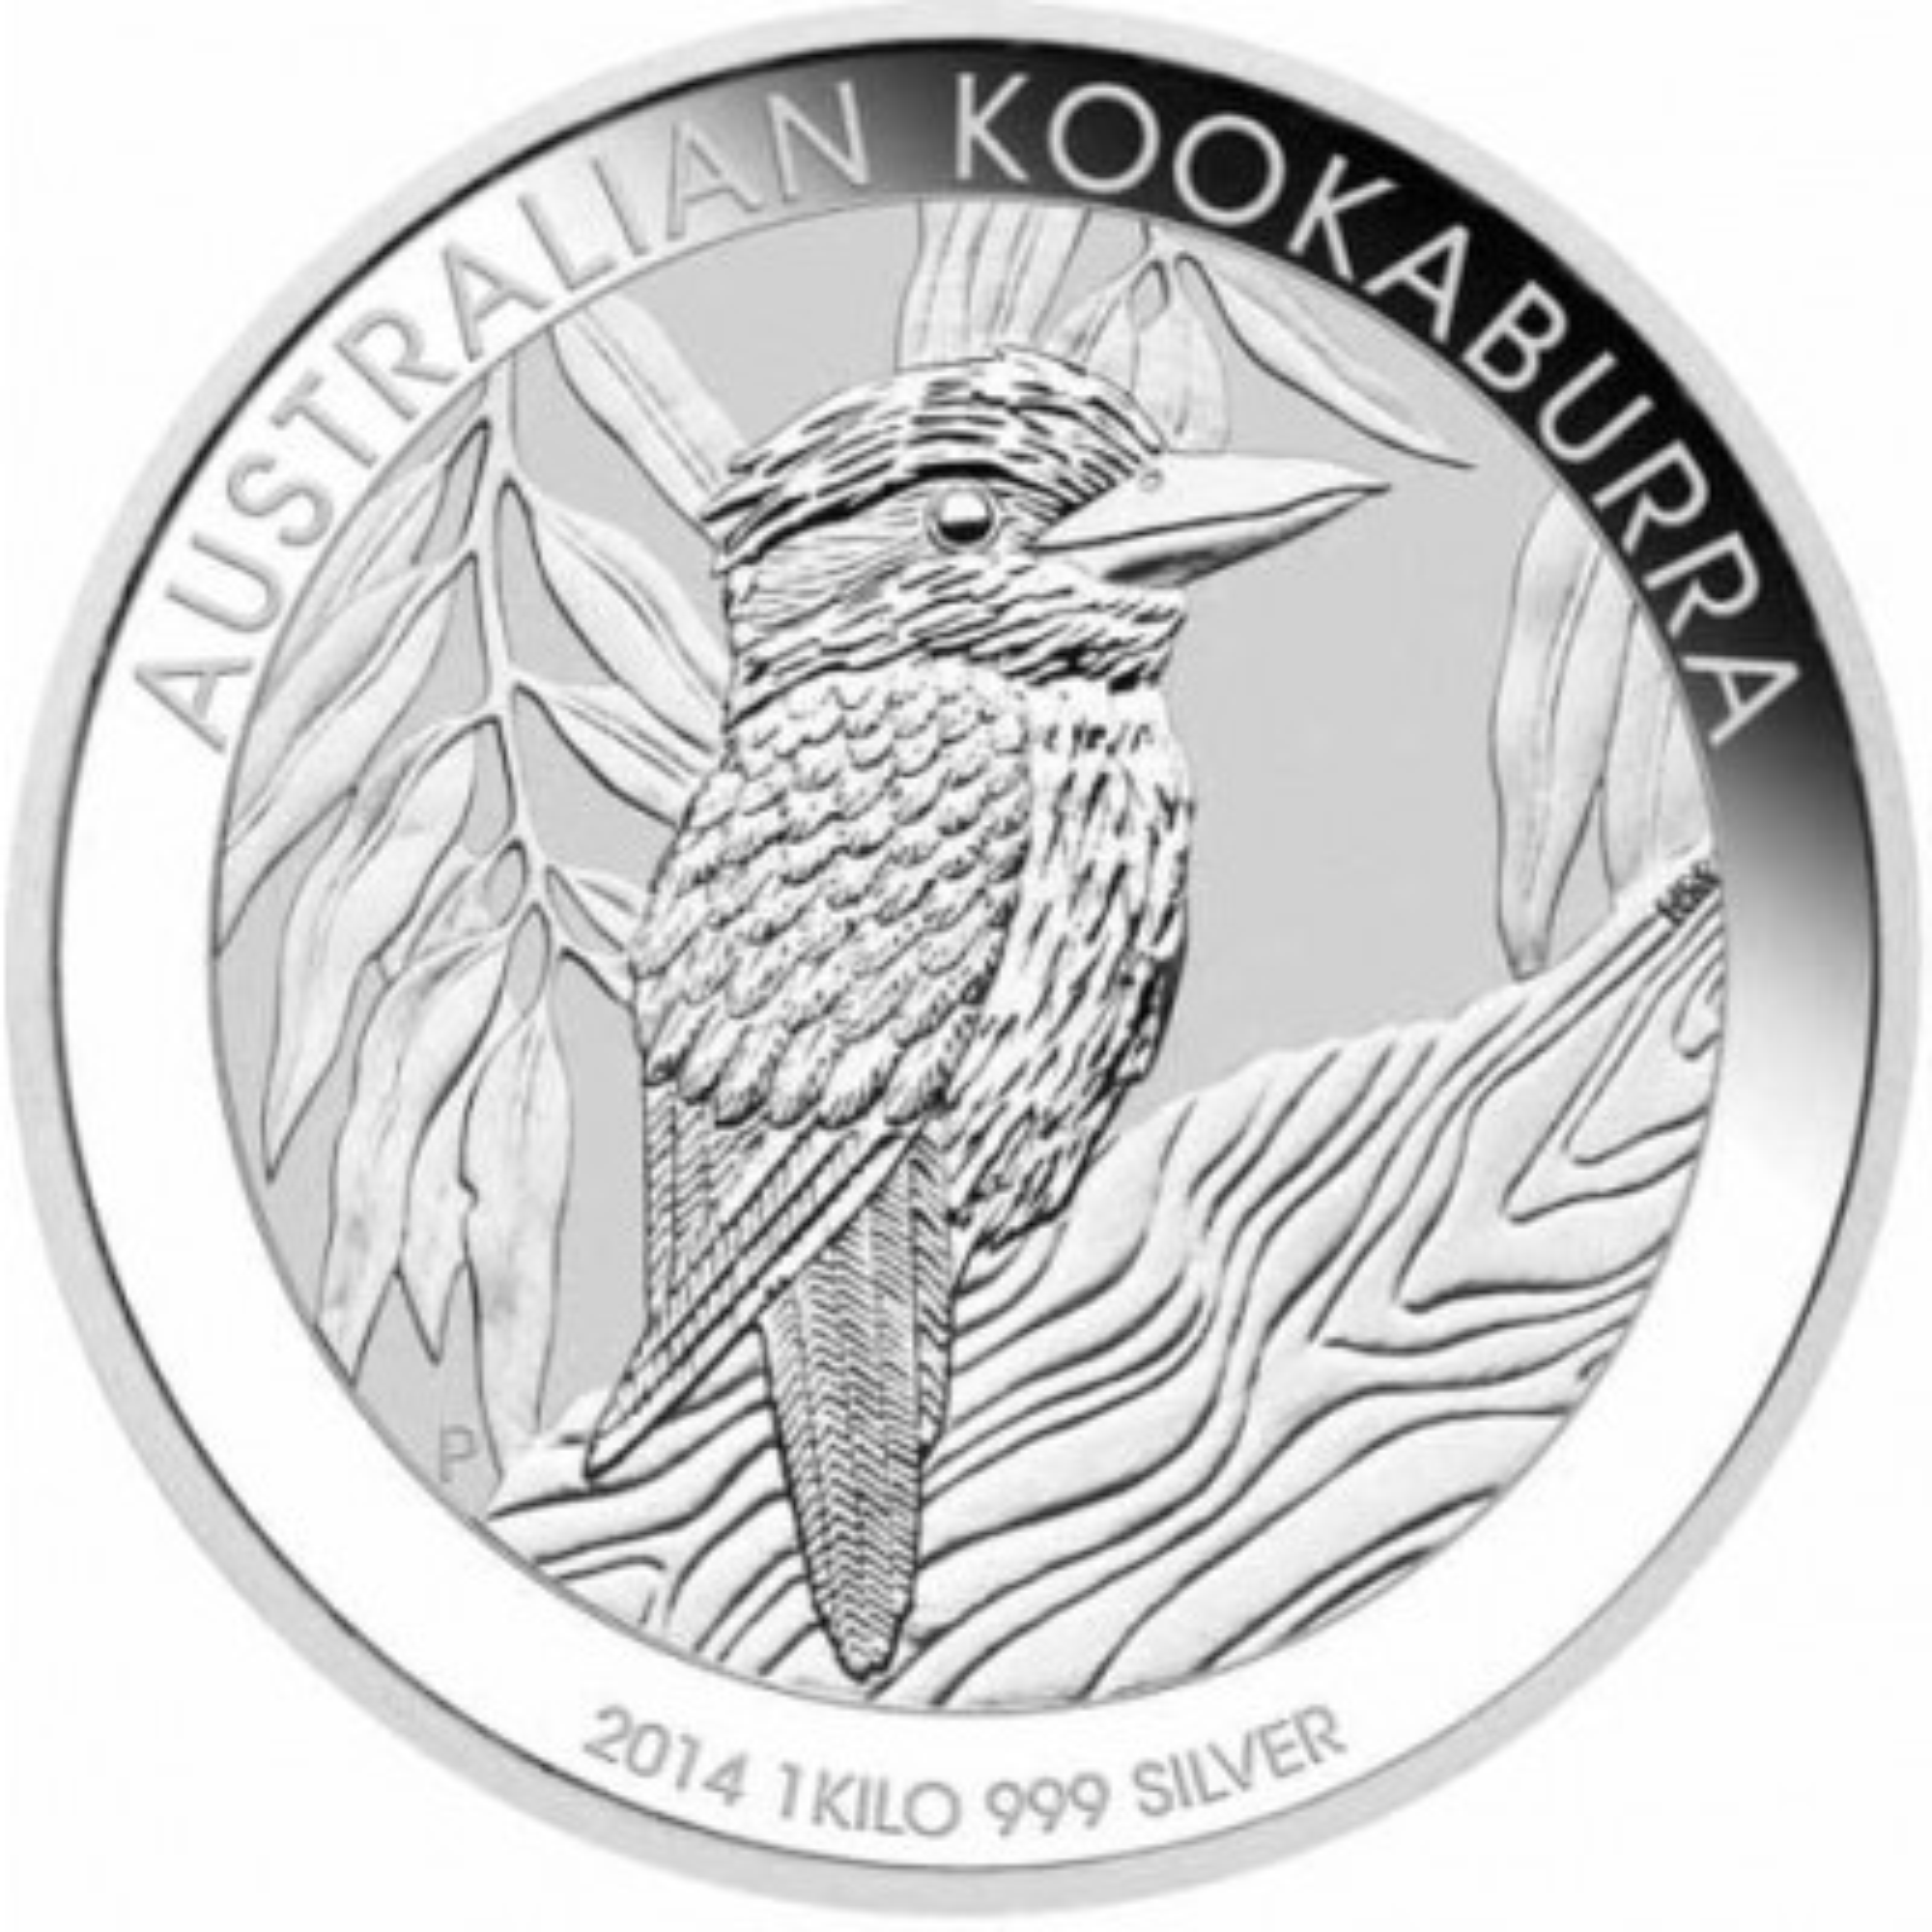 1 kilo silver Kookaburra coin 2014